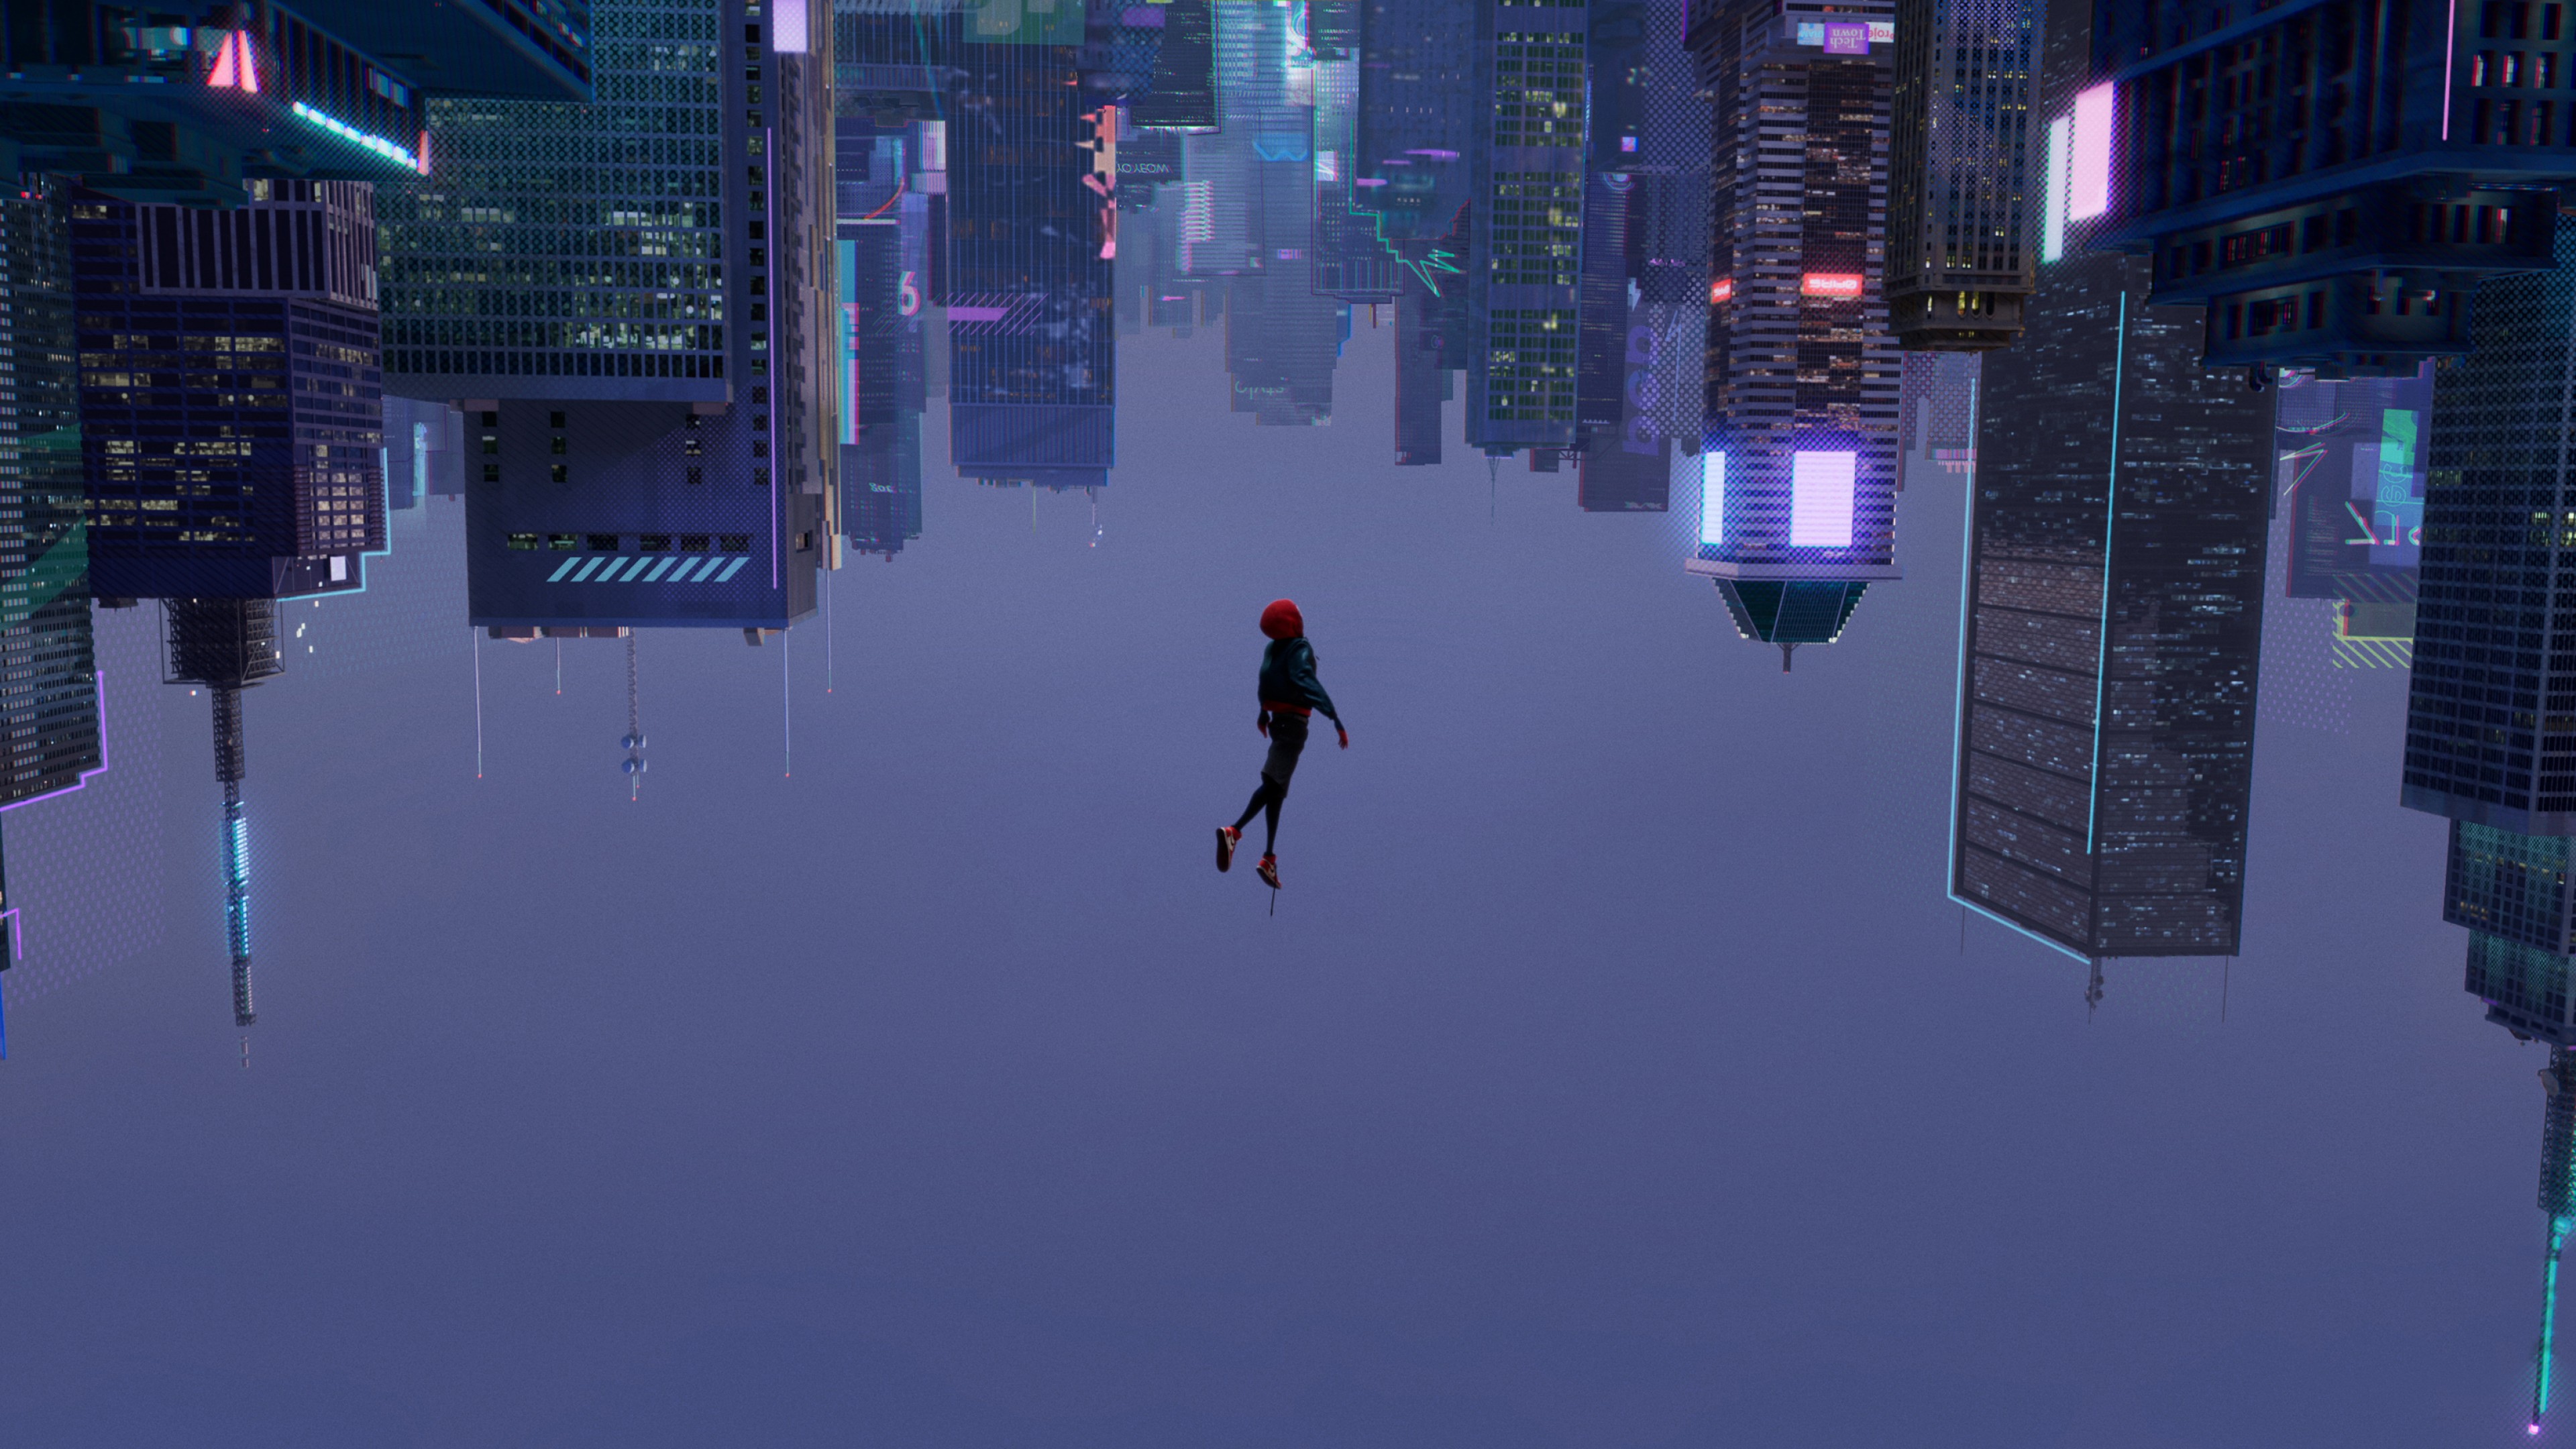 Wallpaper Spider-Man: Into the Spider-Verse, 4K, Movies #20634